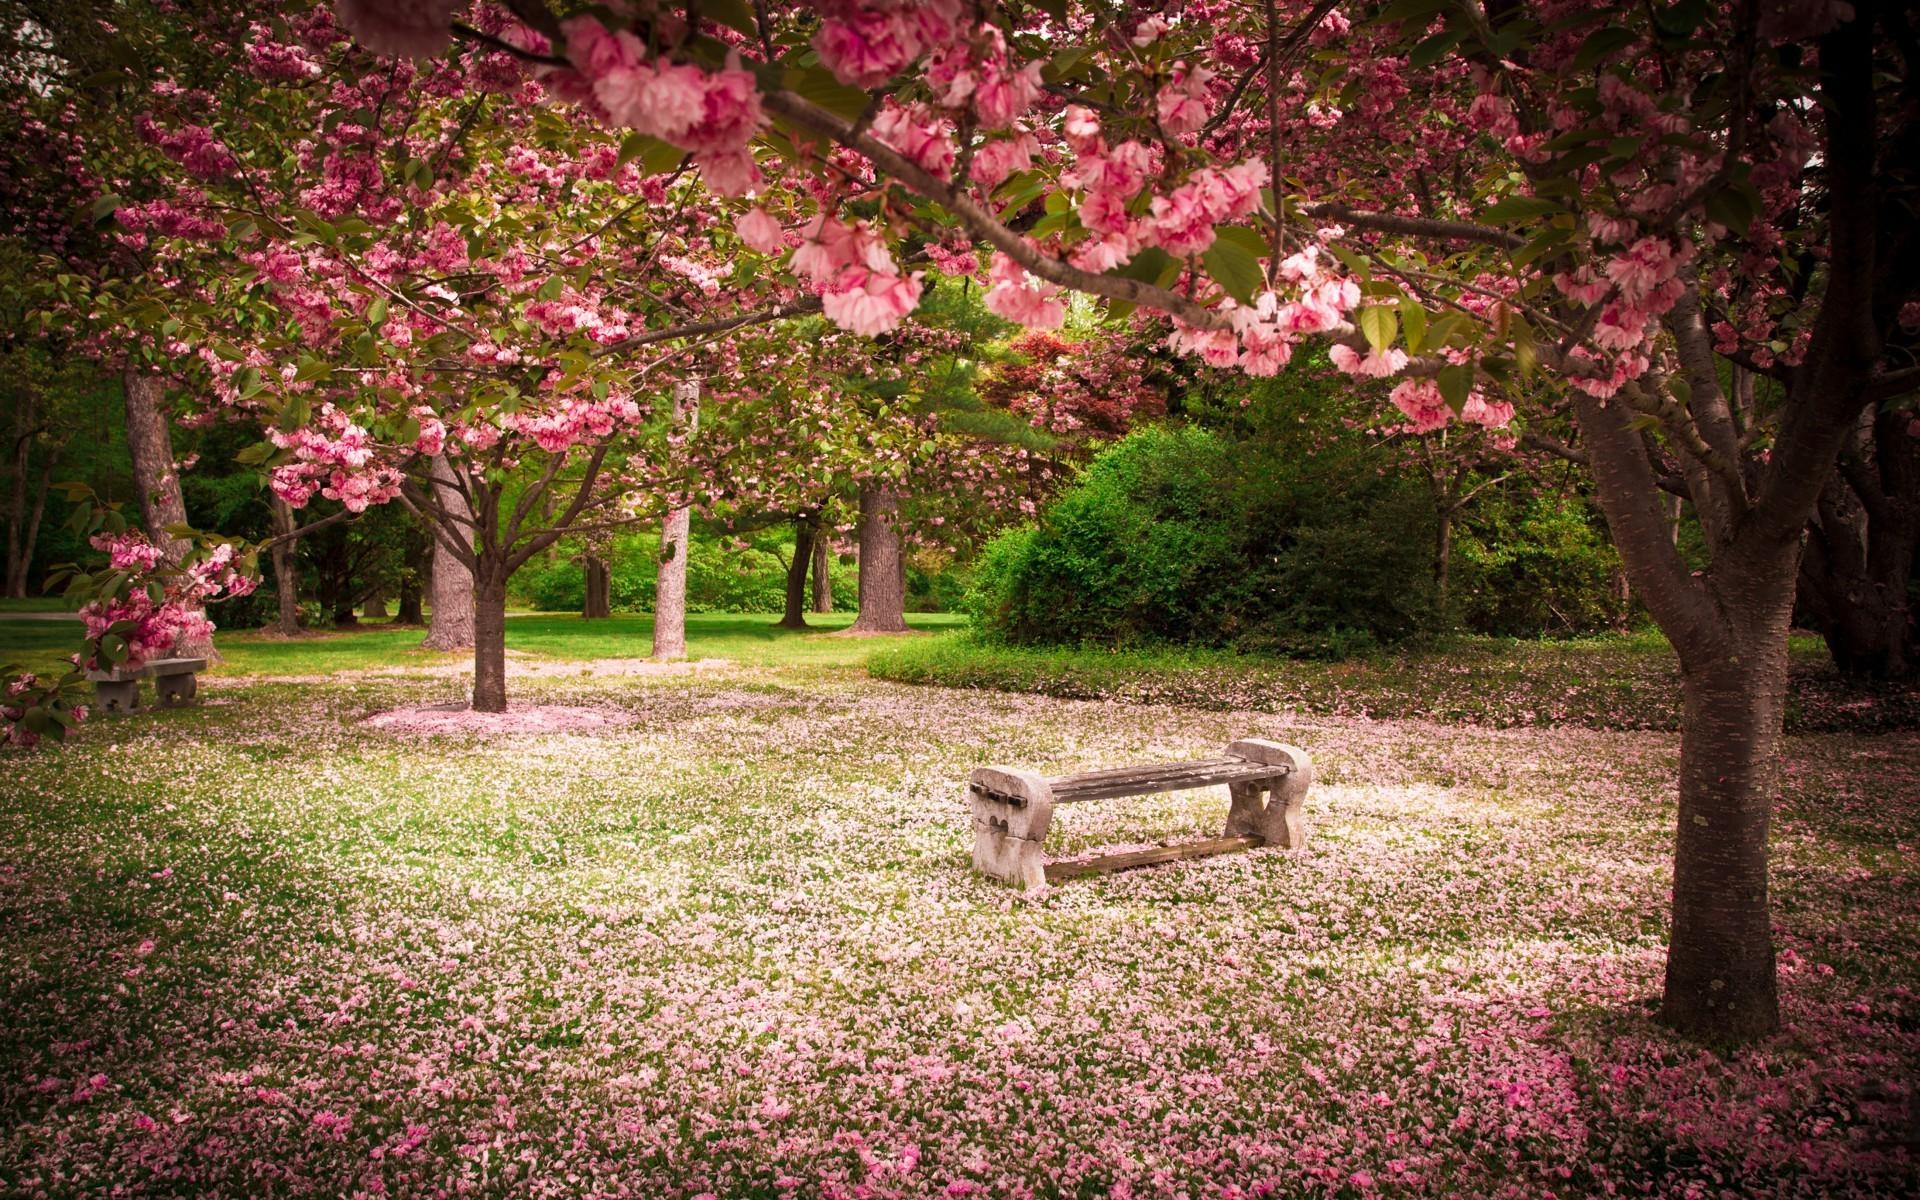 Fondos De Pantalla : Bosque, Jardín, Flor De Cerezo